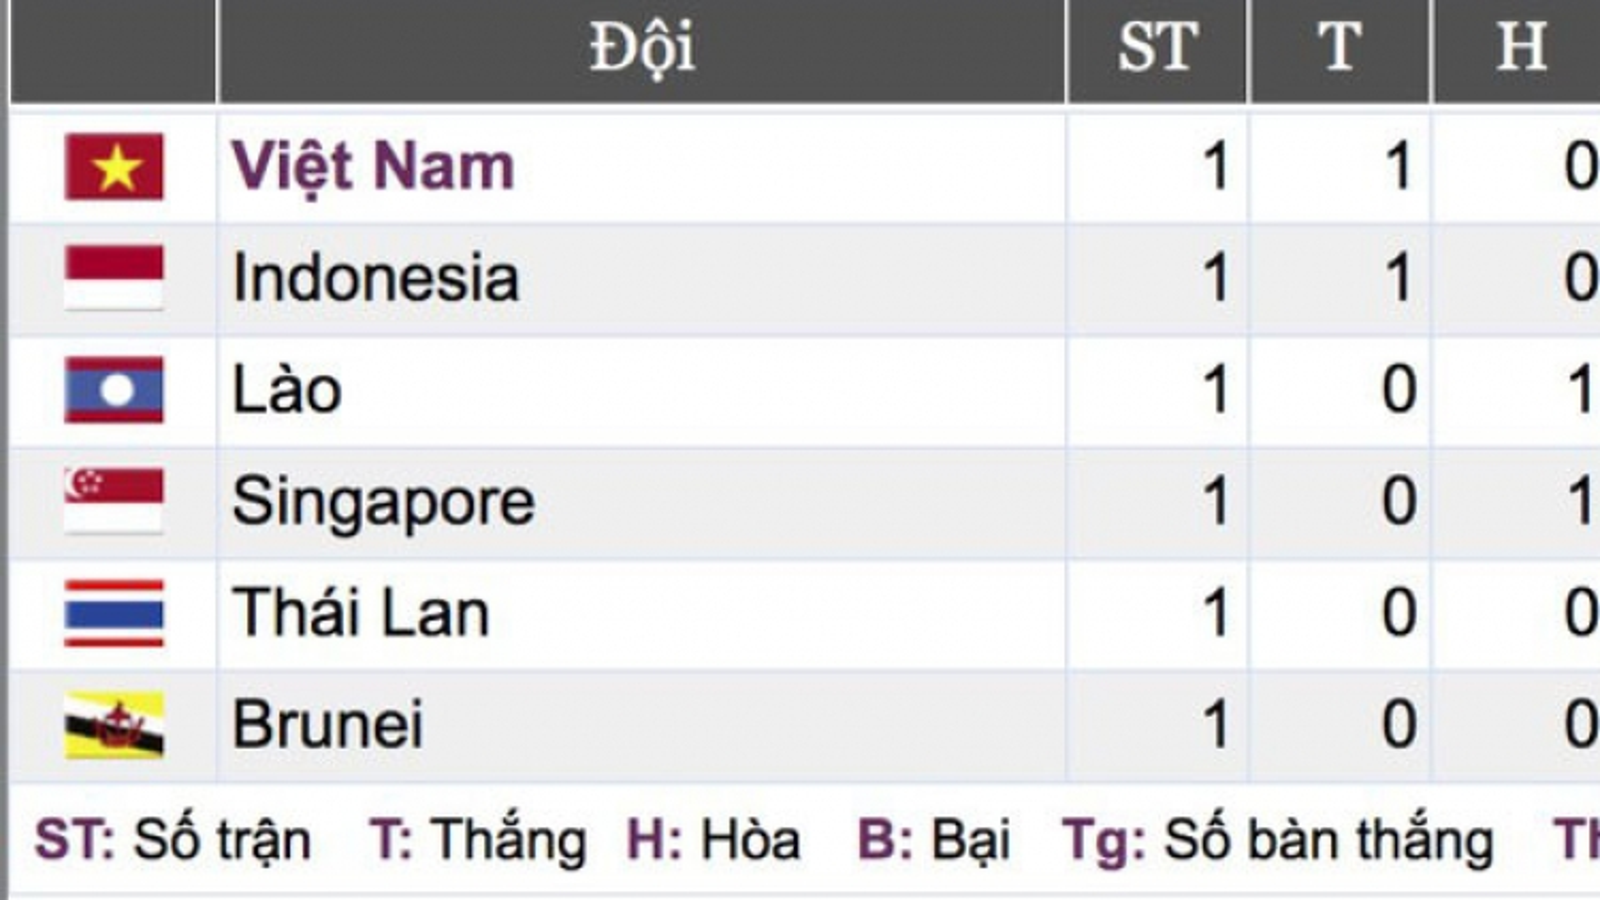 Vietnam's U22 squad tops group rankings at SEA Games 30